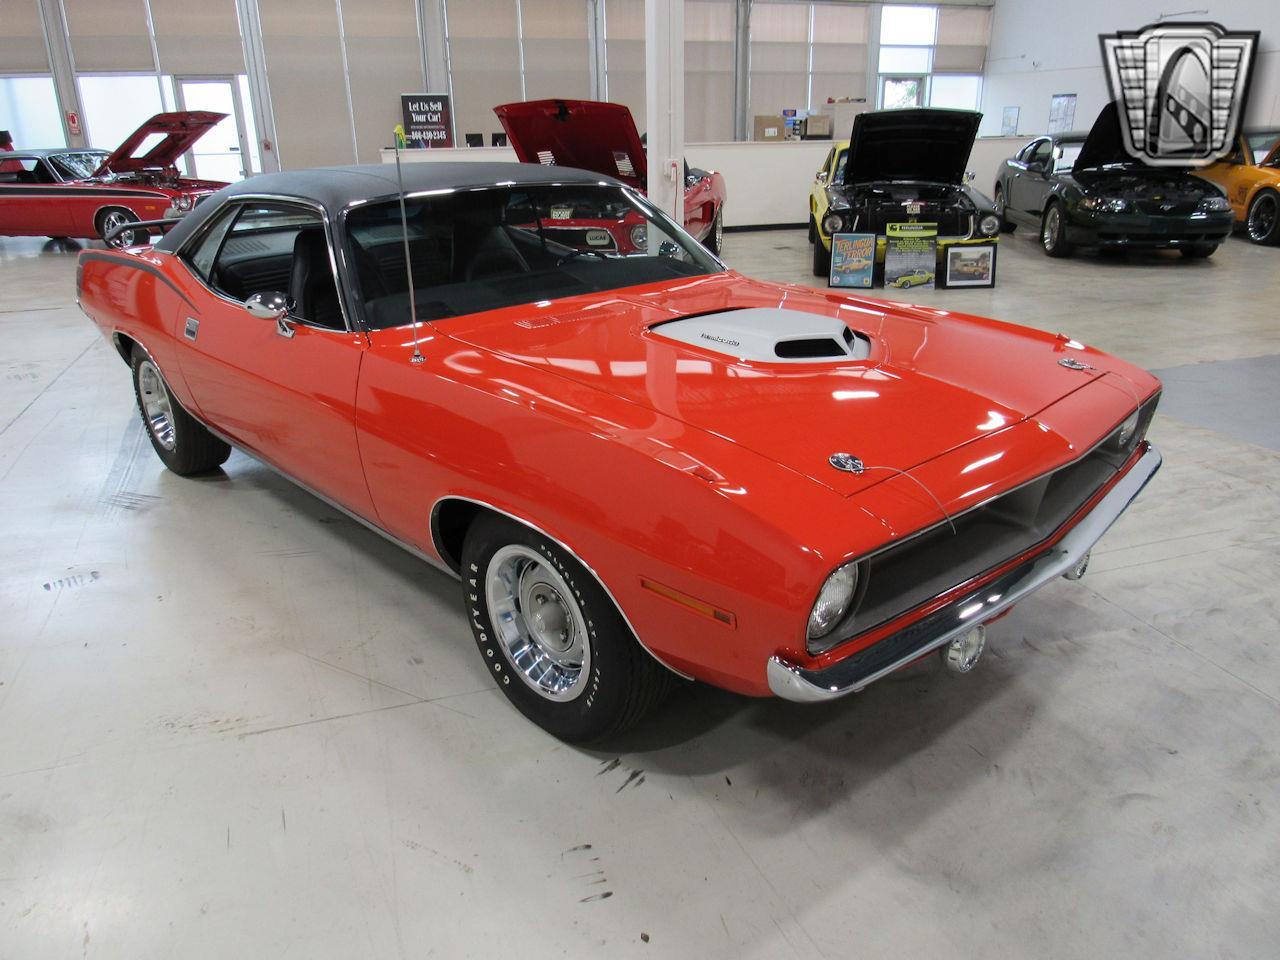 1970 Plymouth Cuda (CC-1381574) for sale in O'Fallon, Illinois